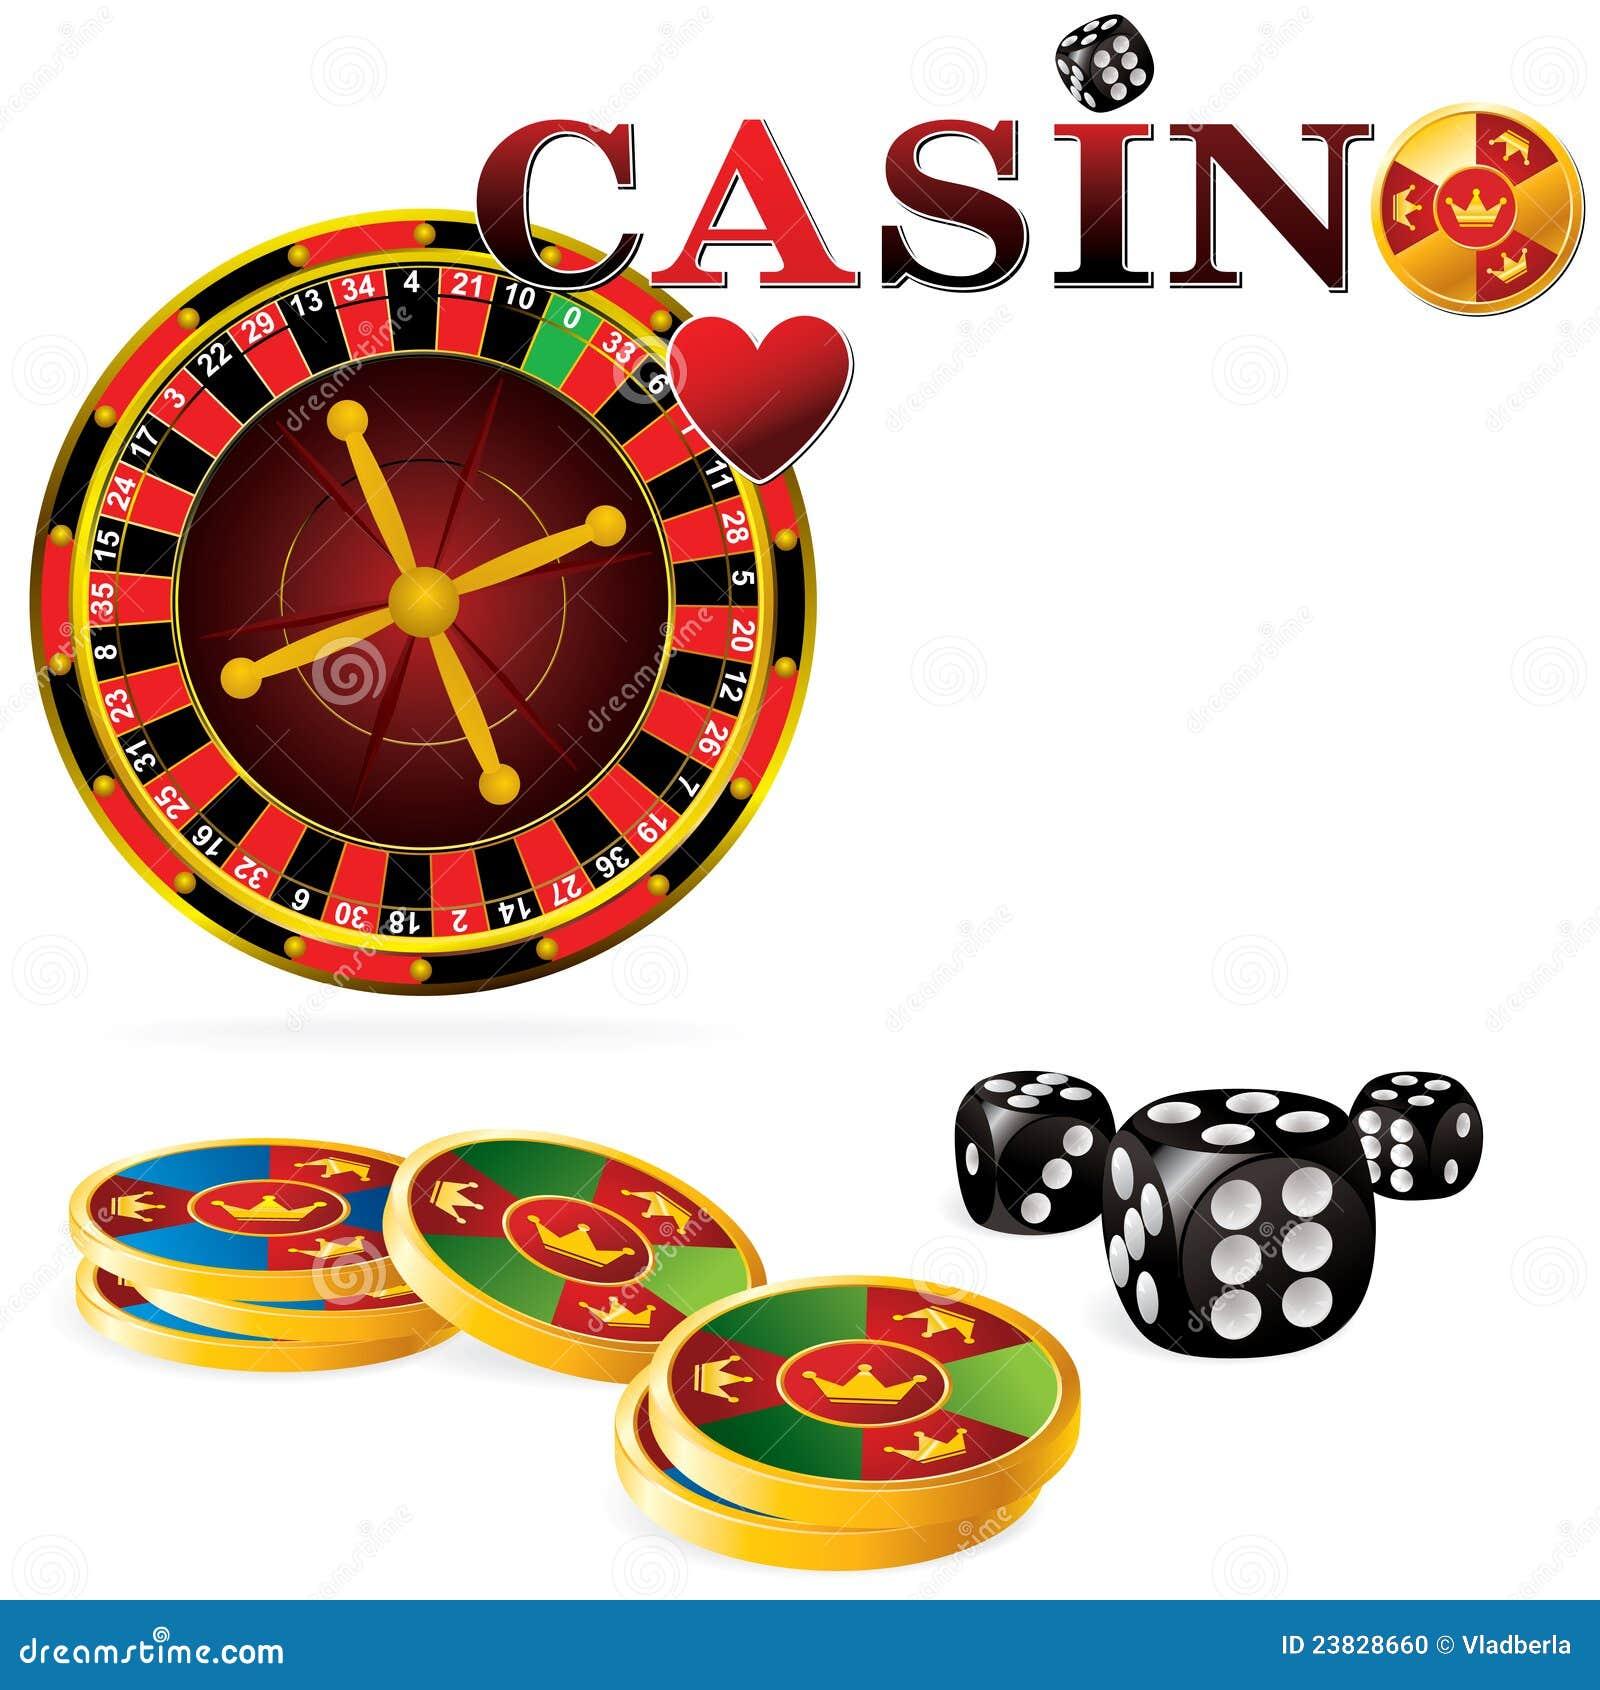 top online casino piraten symbole